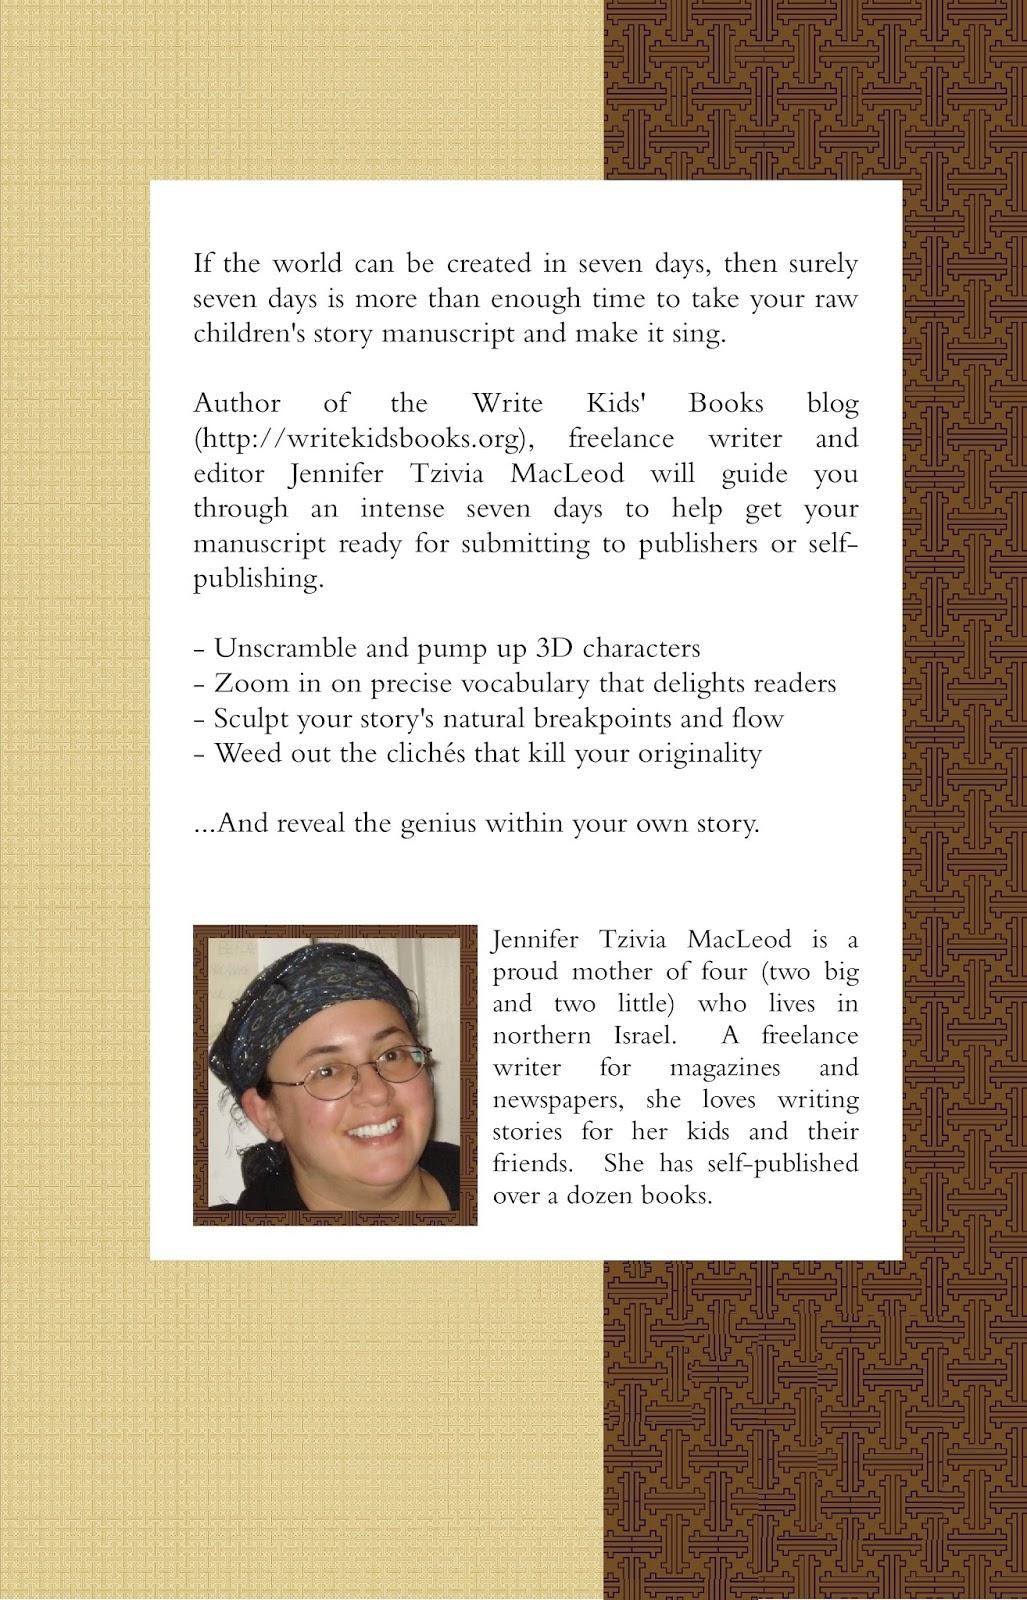 The Seven Day Manuscript Machine, by Jennifer Tzivia MacLeod (back cover)